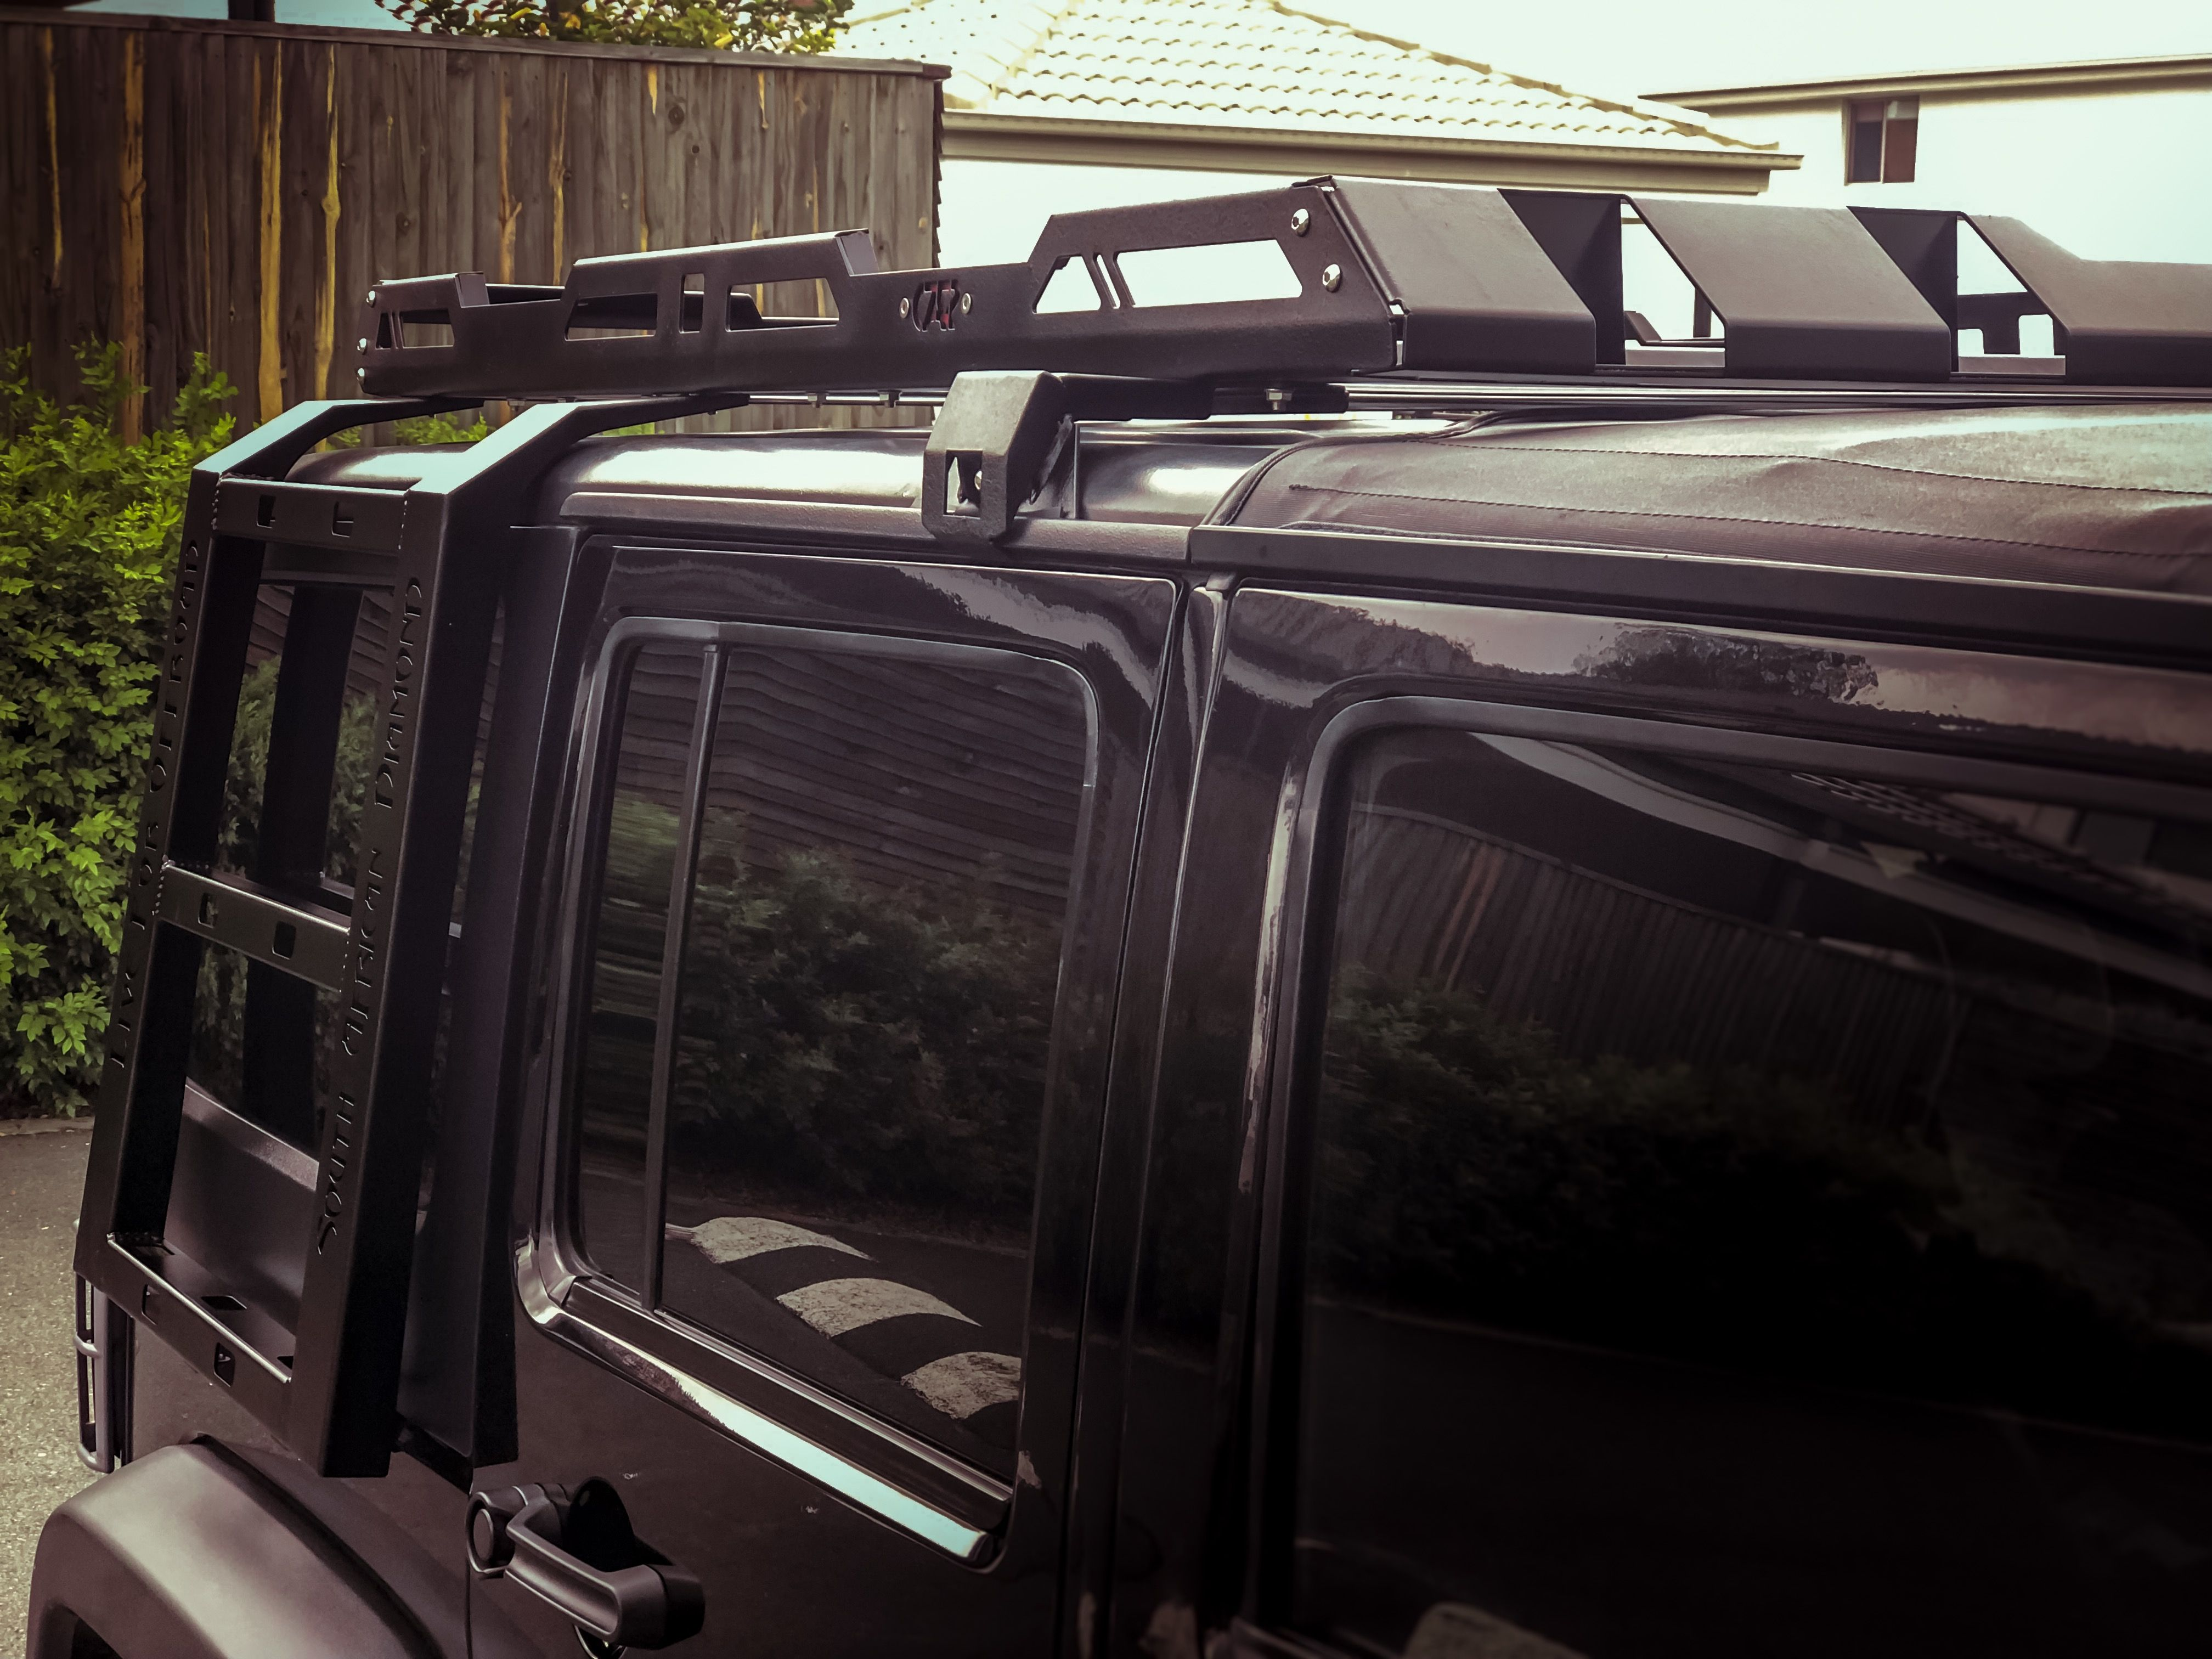 Buy Stealth Rack Heavy Duty Low Profile Roof Rack 4 Door Jeep Wrangler Roof Racks Jeep Wrangler Offroad Accessories Roof Rack Jeep Wrangler Roof Racks